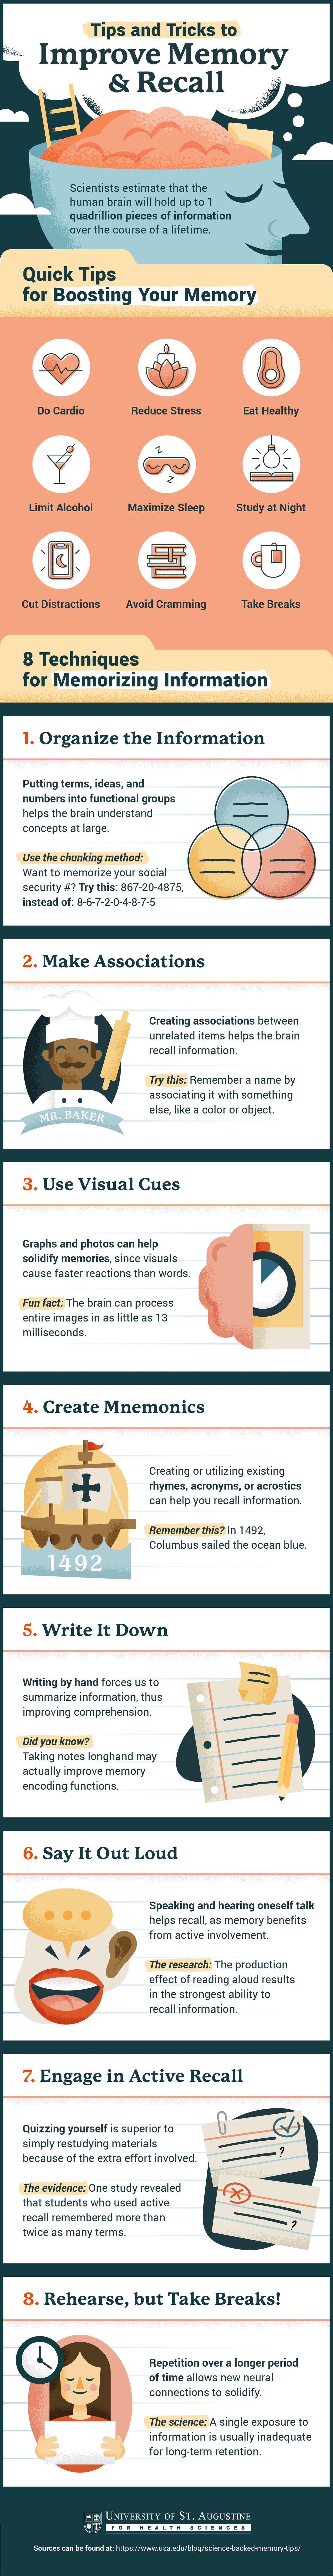 infographic_improve memory & recall